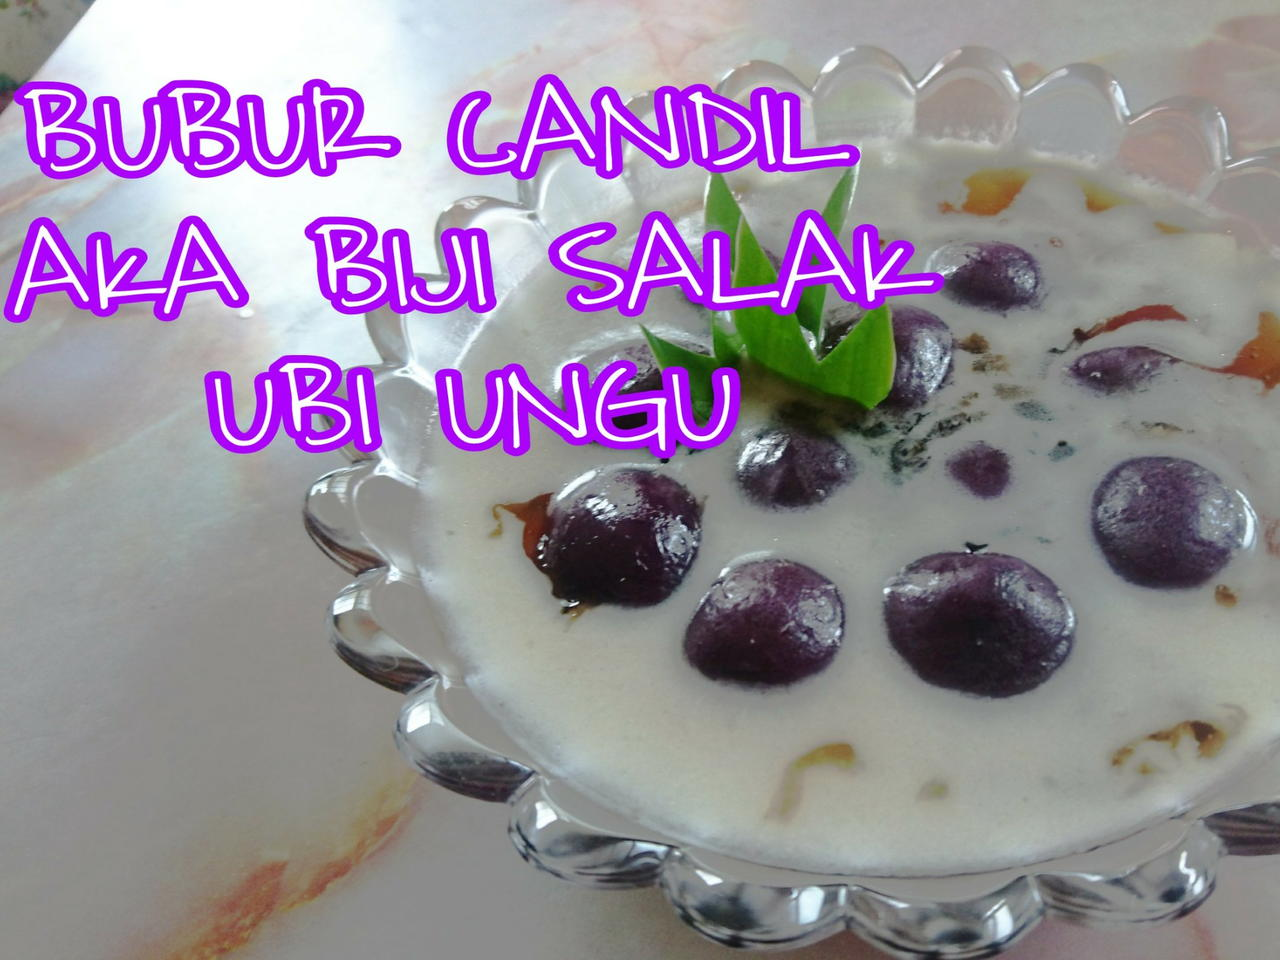 Resep Bubur Candil Aka Biji Salak Ubi Ungu Video Oleh Dapur Craftlog